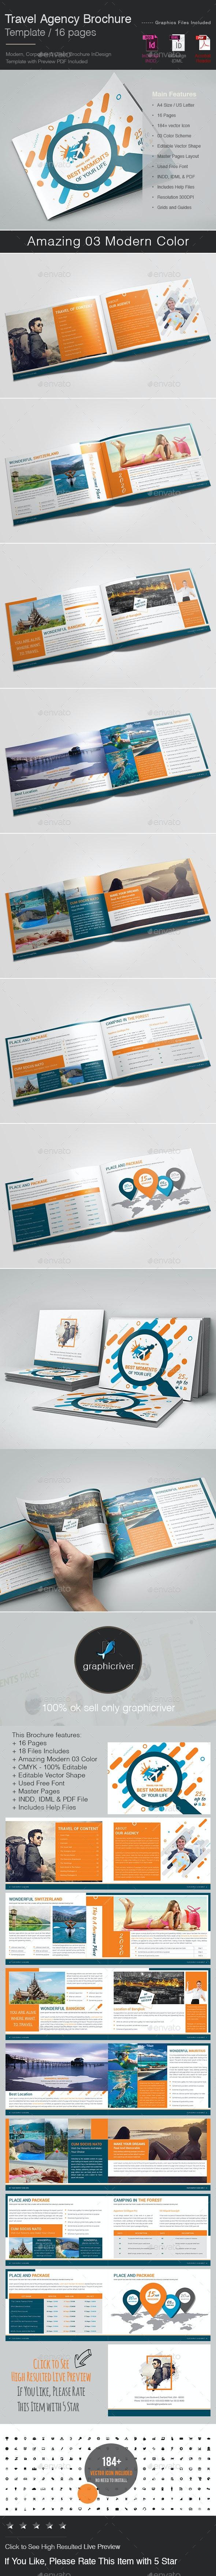 Travel Agency Brochure Template - Corporate Brochures